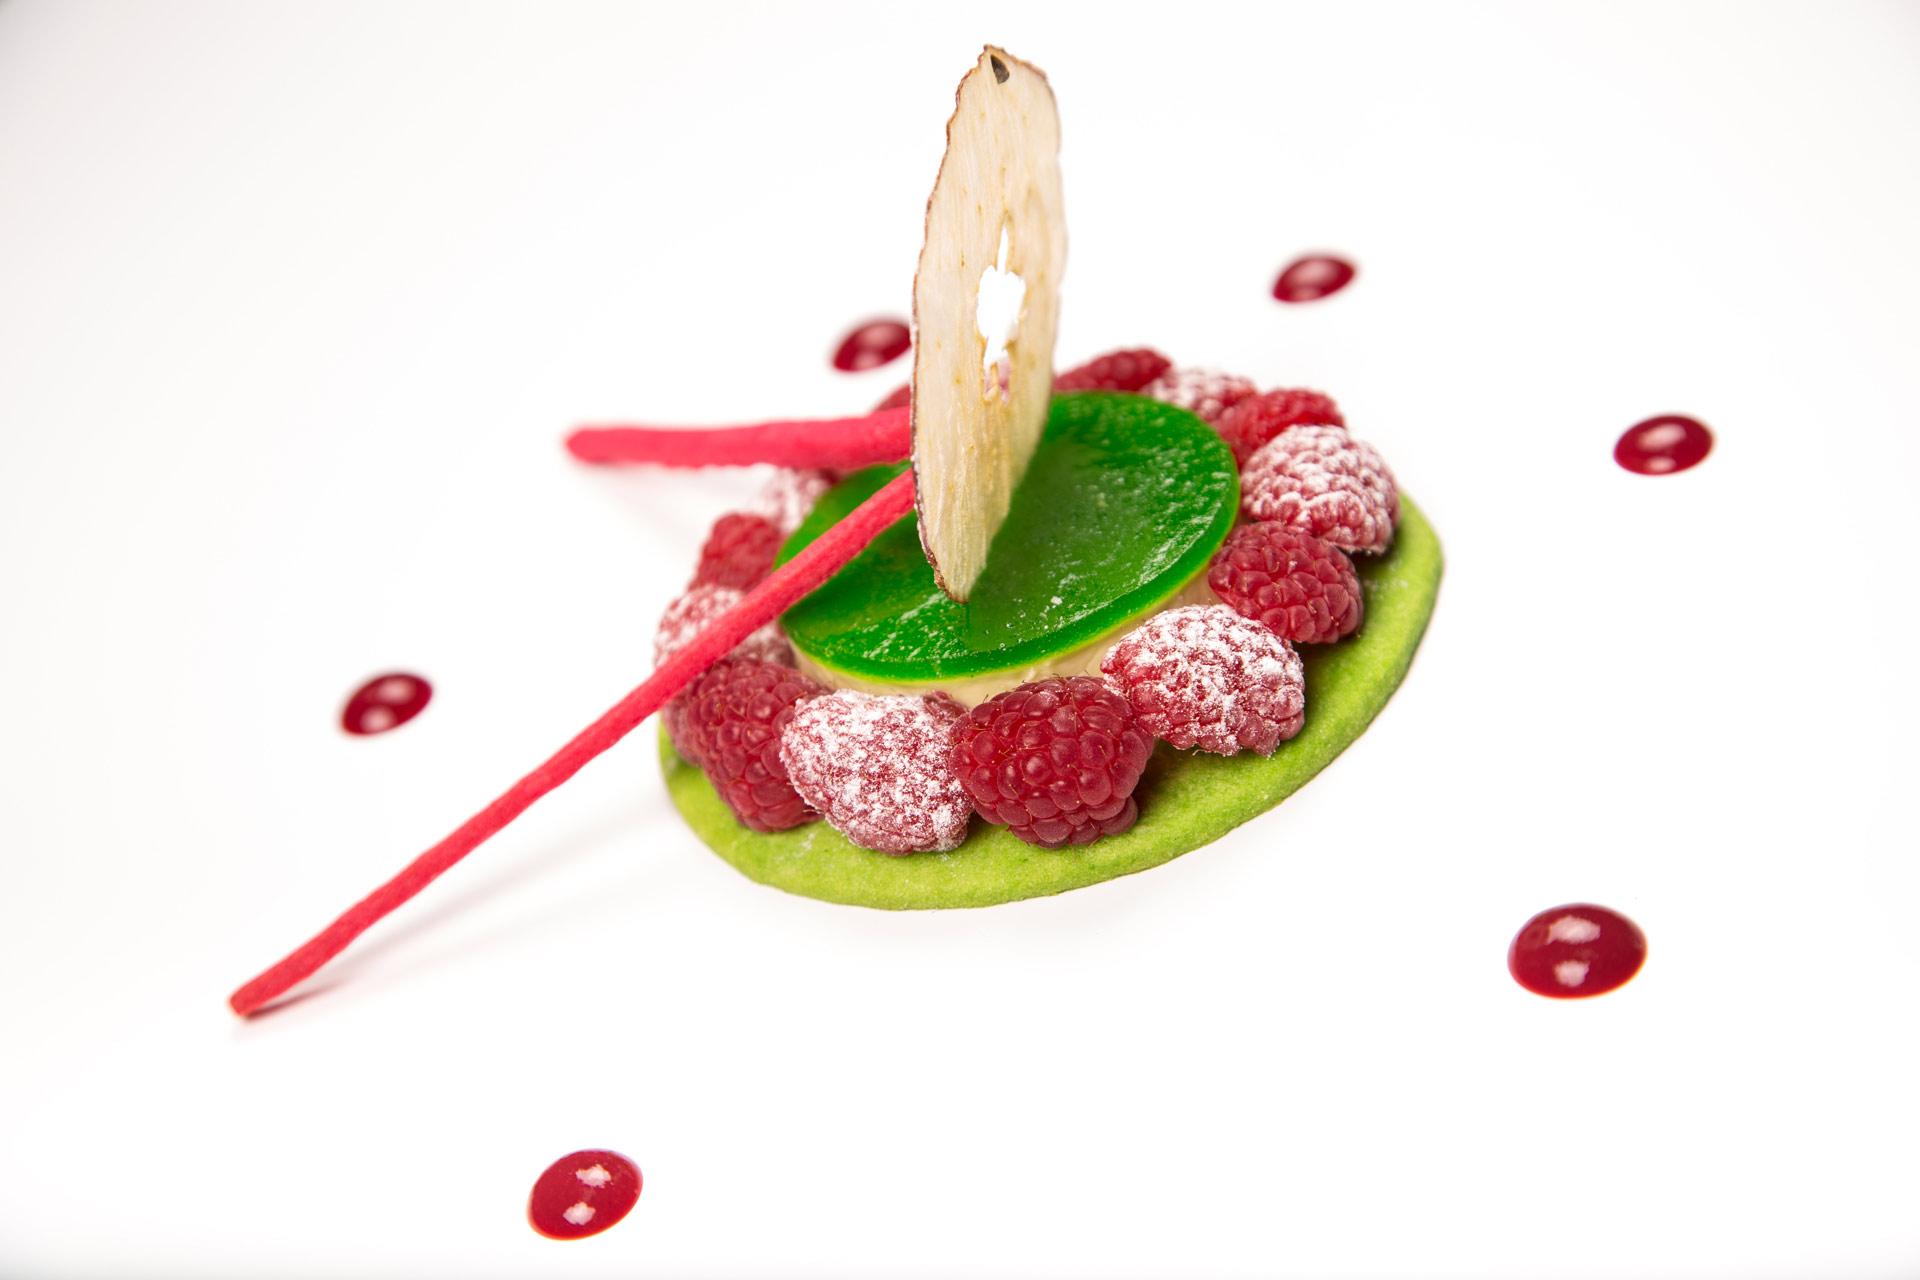 dejeuner-dessert-croisiere-bodega-rouen